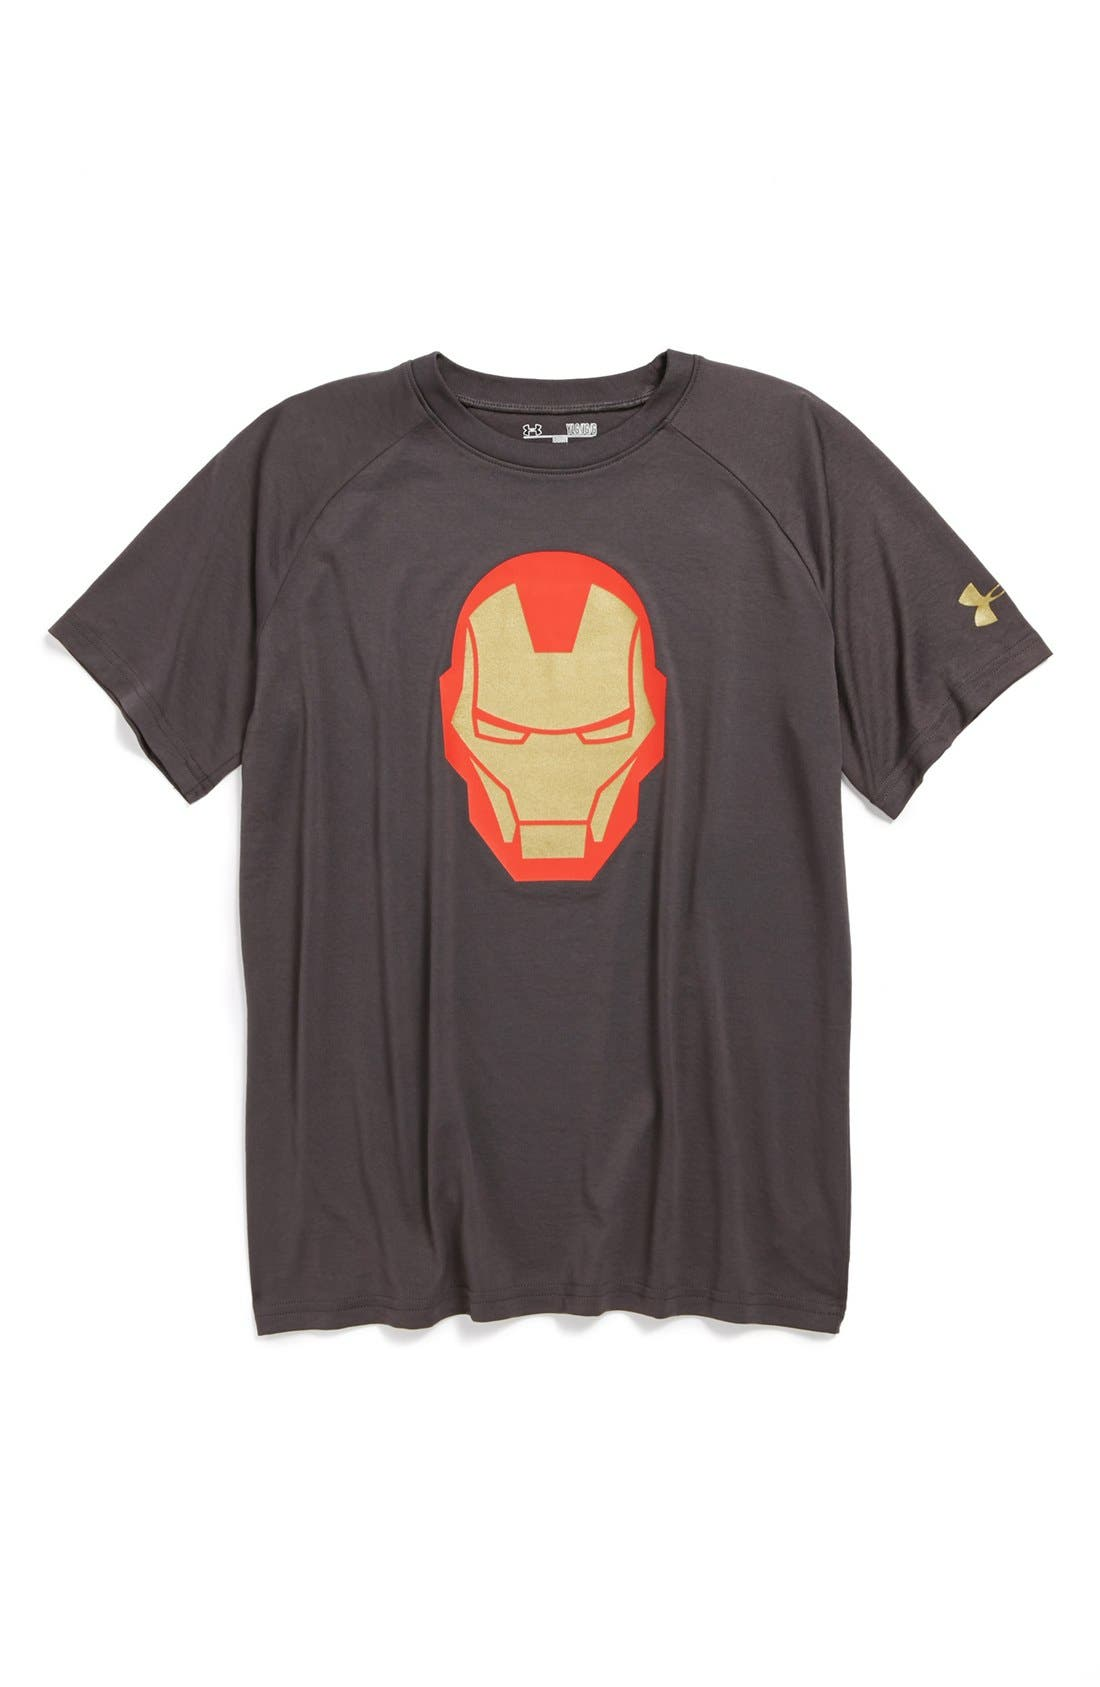 Alternate Image 1 Selected - Under Armour 'Iron Man' HeatGear® T-Shirt (Big Boys)